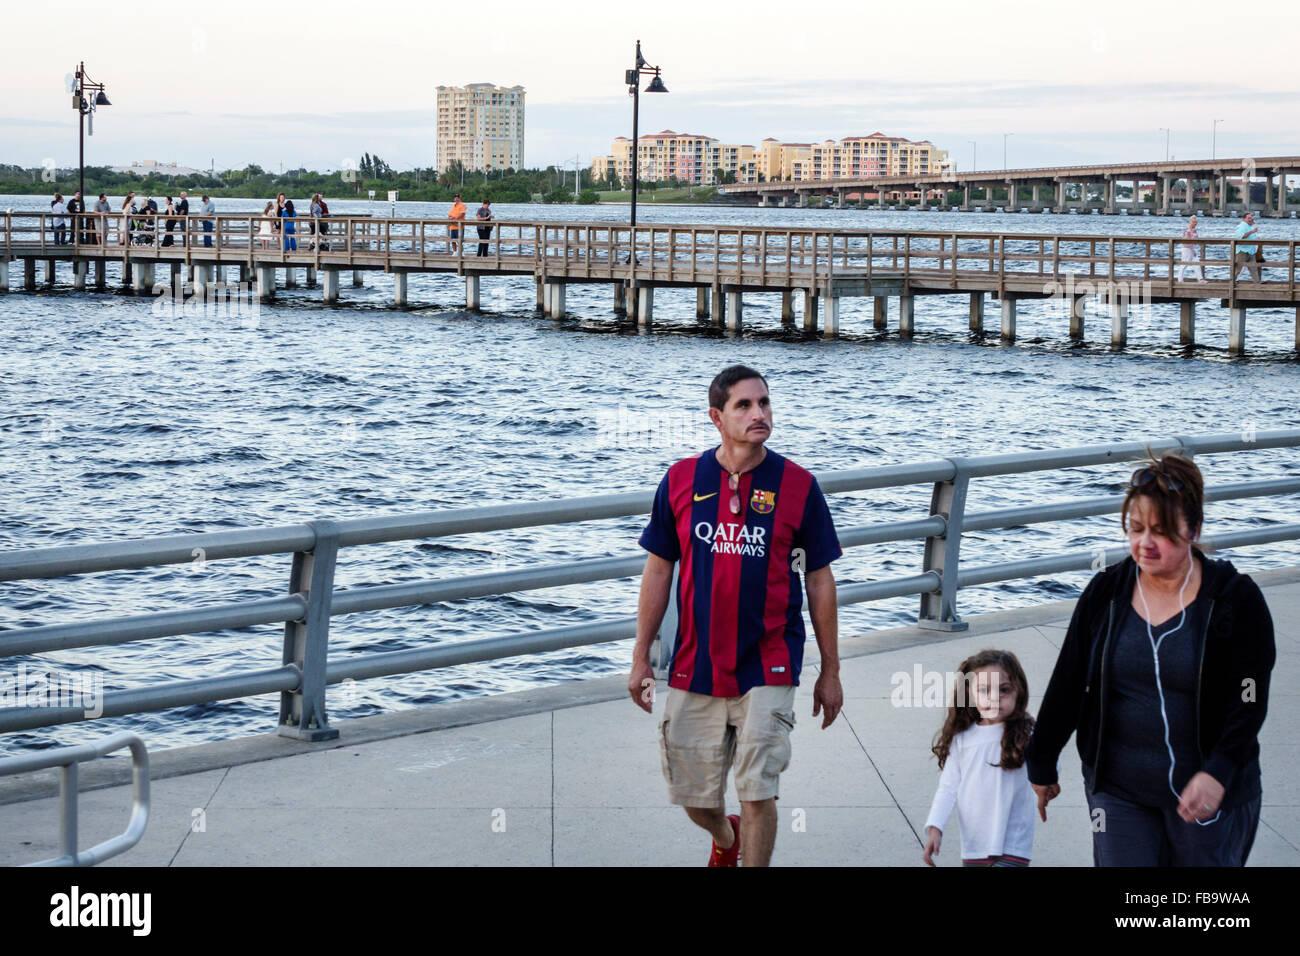 Bradenton Florida Manatee River water Riverwalk Park Green Bridge waterfront Middle Eastern man father woman mother - Stock Image